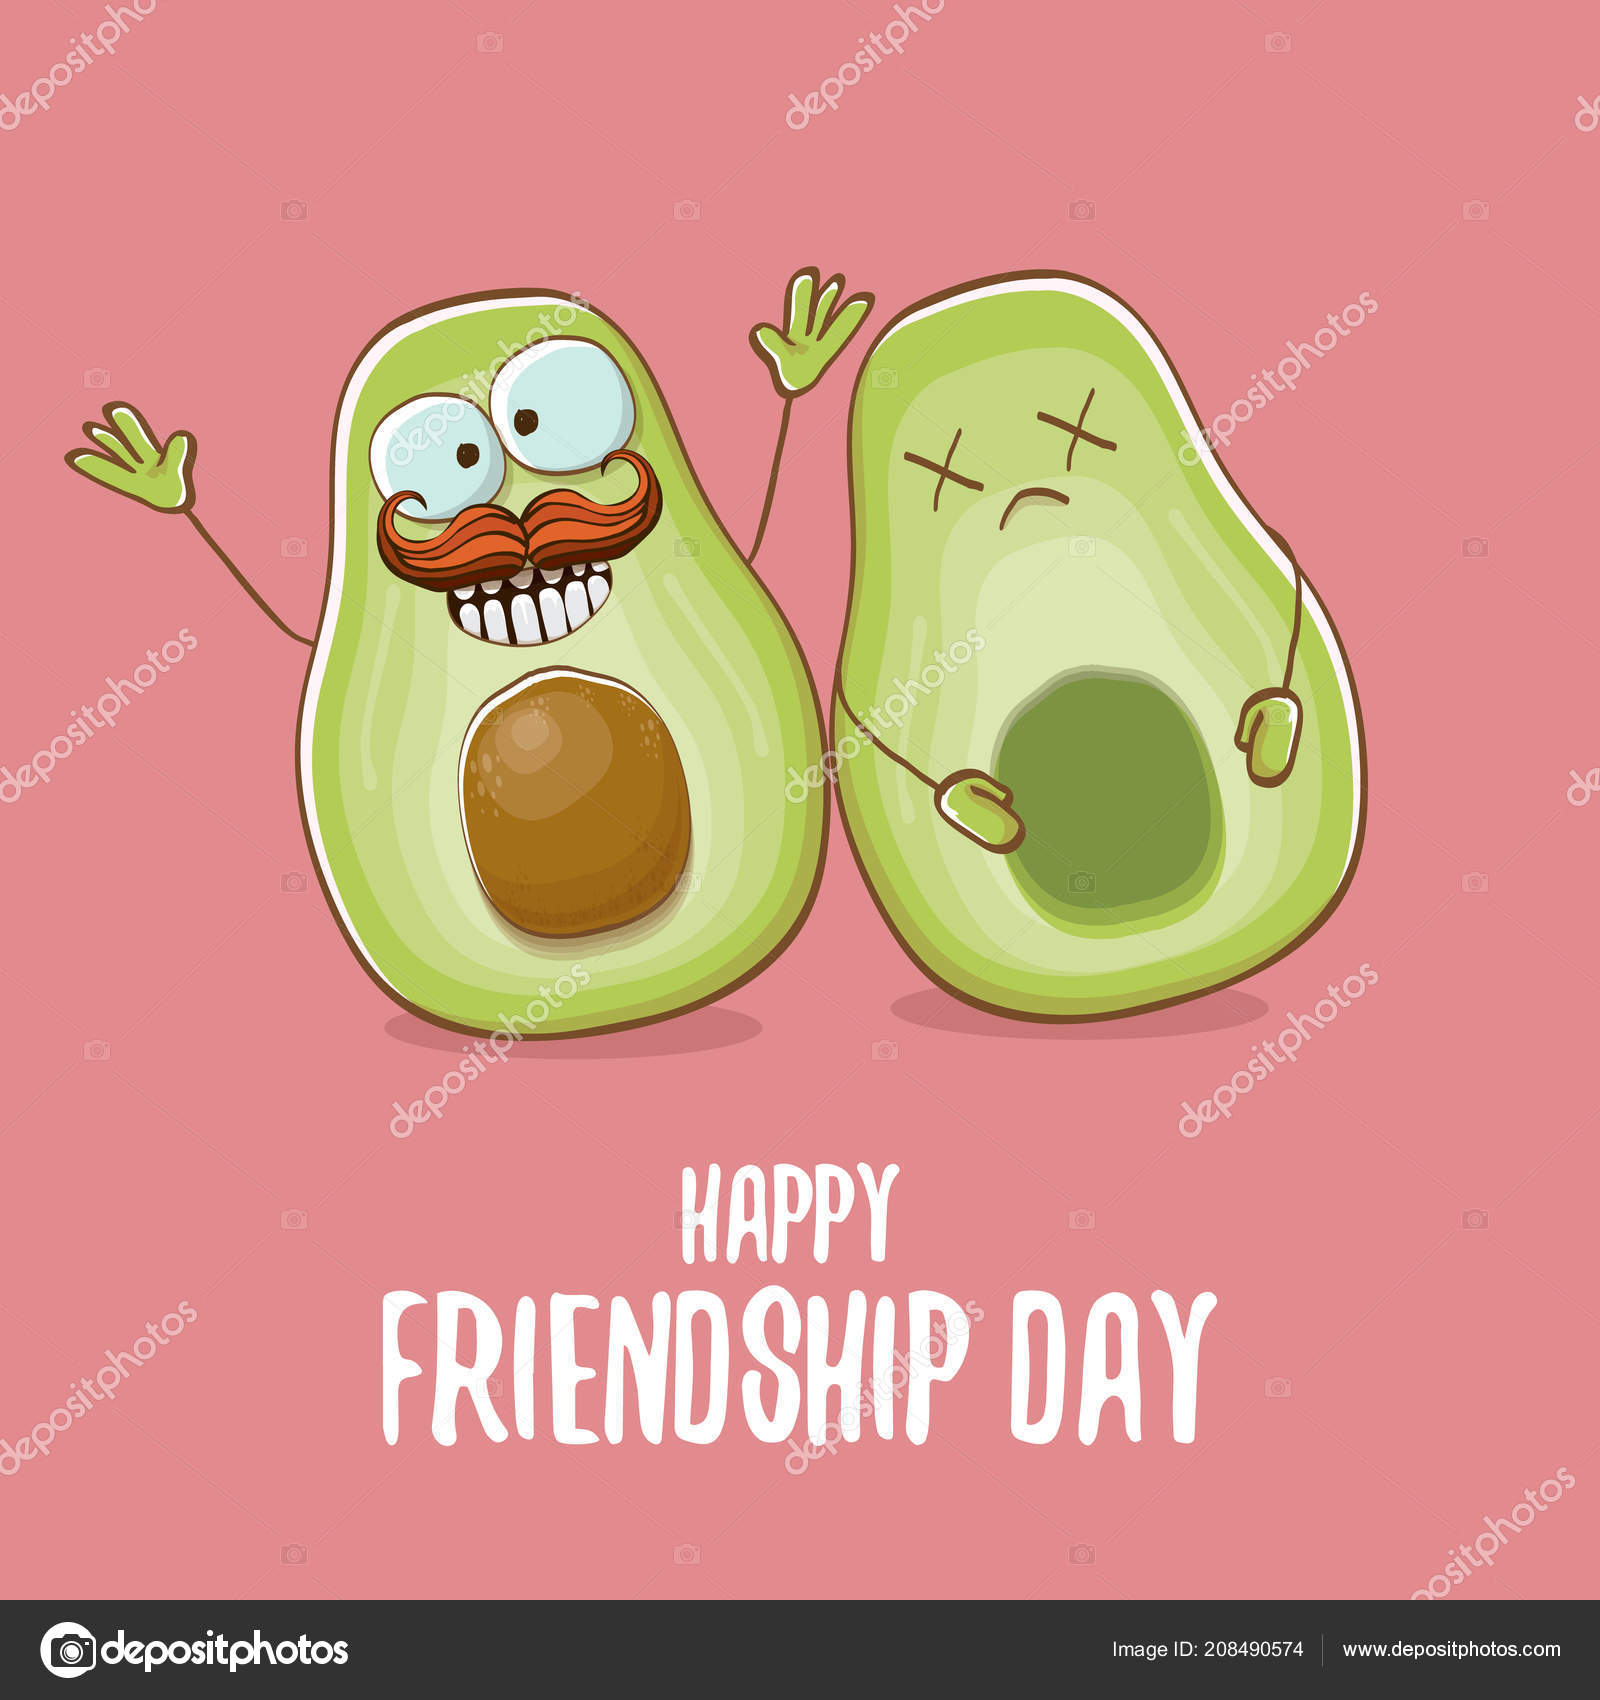 Happy friendship day cartoon comic greeting card with two green happy friendship day cartoon comic greeting card with two green avocado friends friendship day concept m4hsunfo